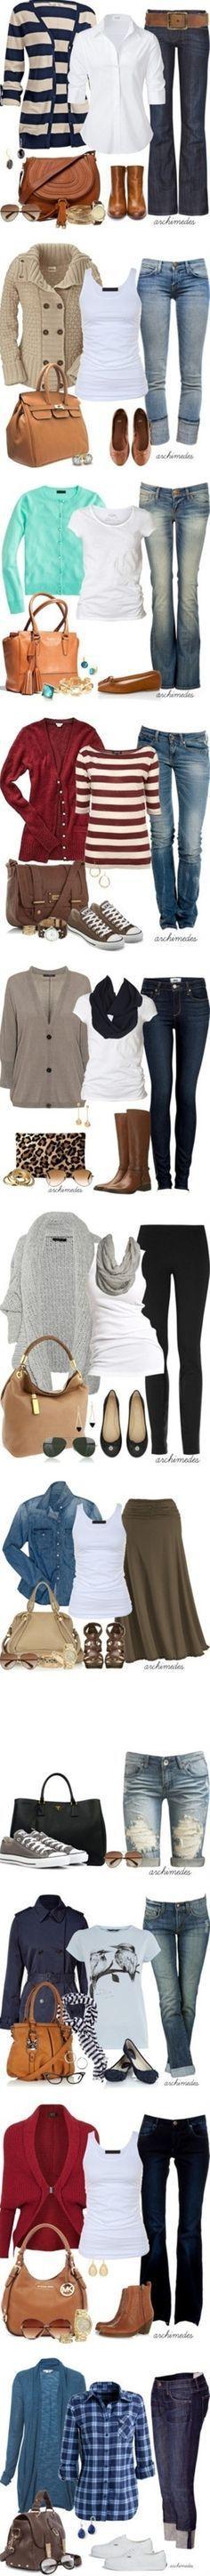 Autumn outfit ideas 2014